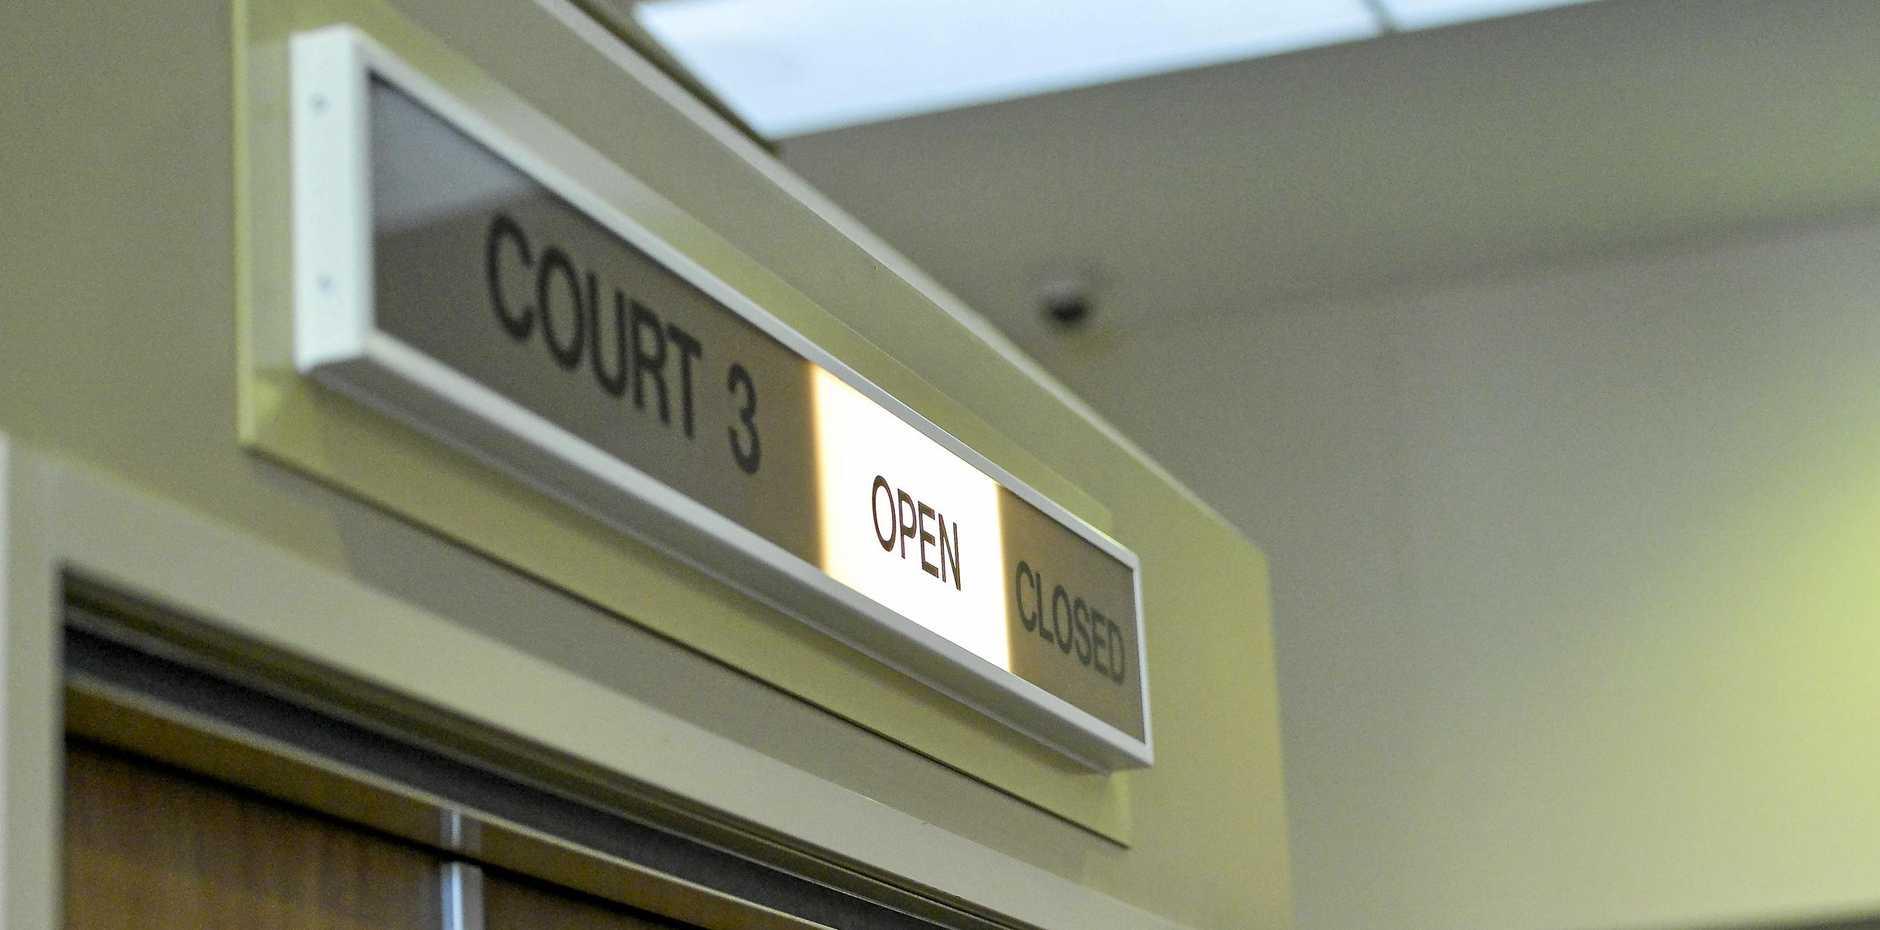 RE-RUN: The trial of Kenneth Robert Douglas will restart tomorrow.